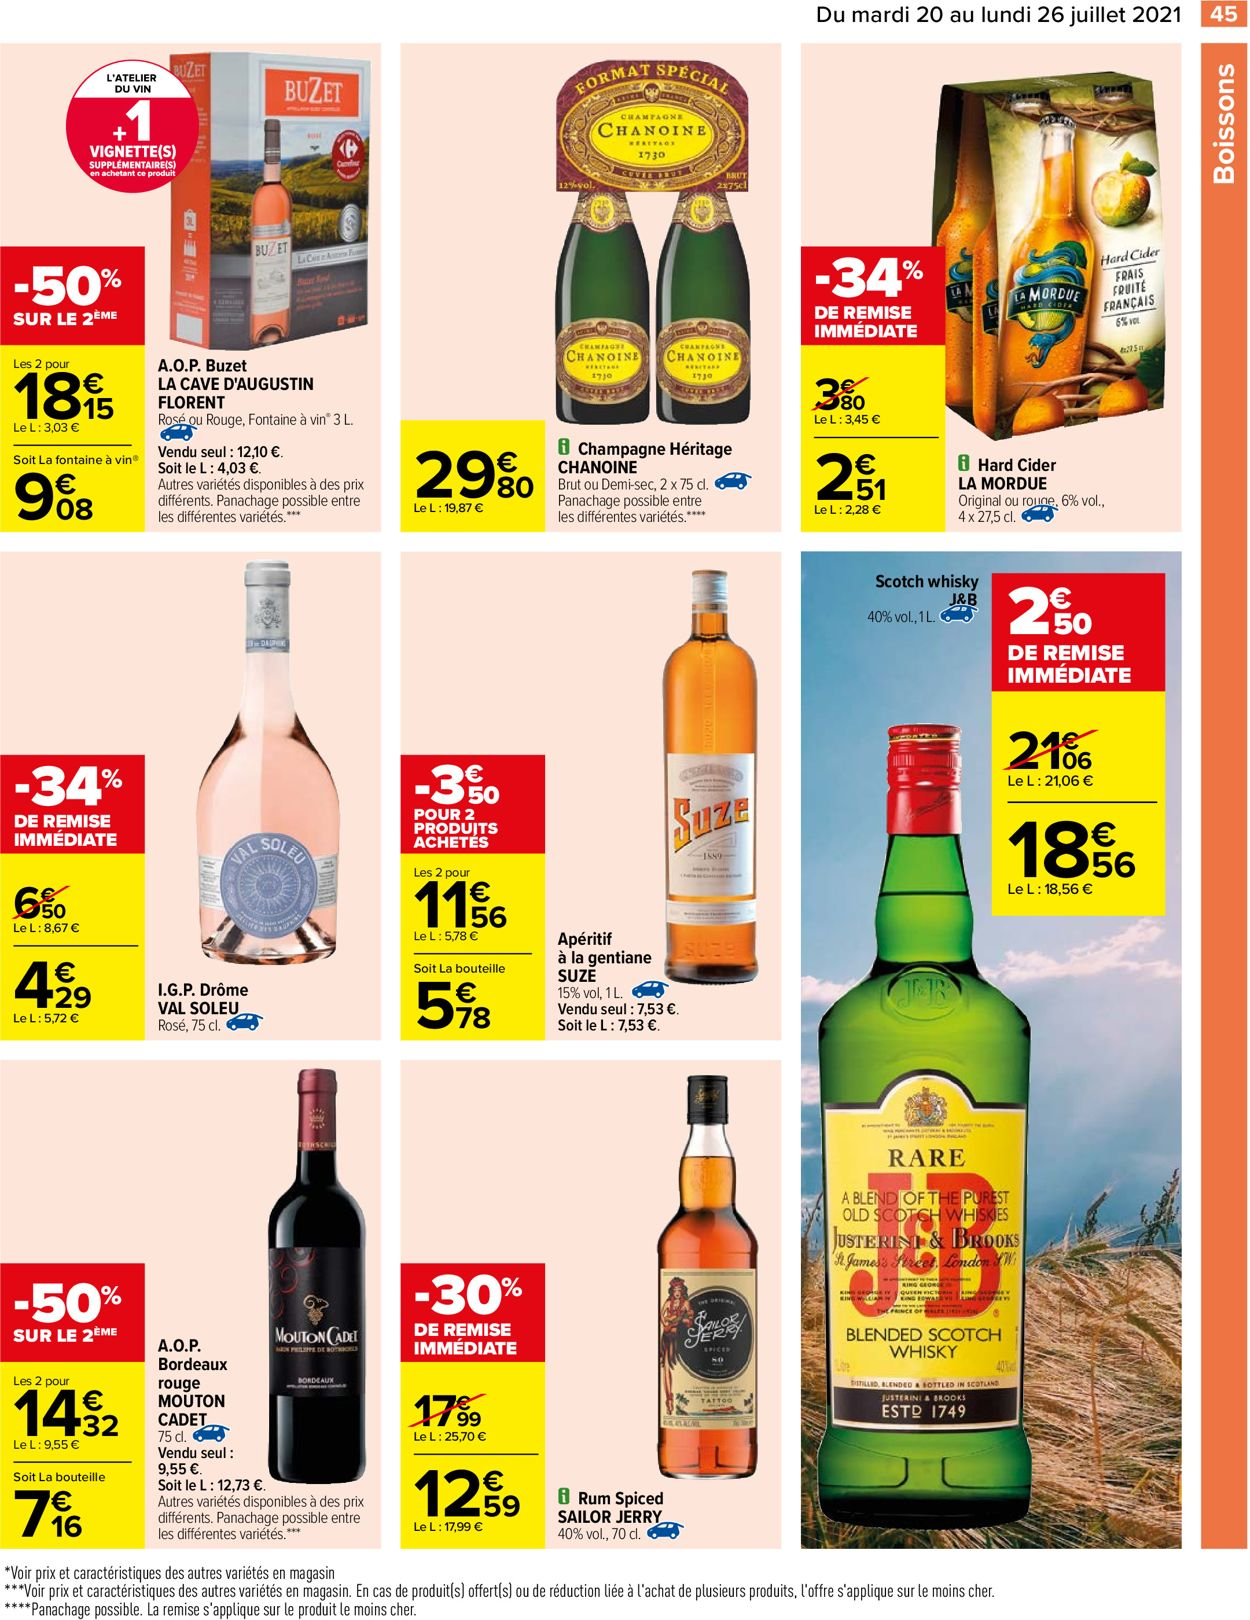 Carrefour Catalogue - 20.07-26.07.2021 (Page 49)